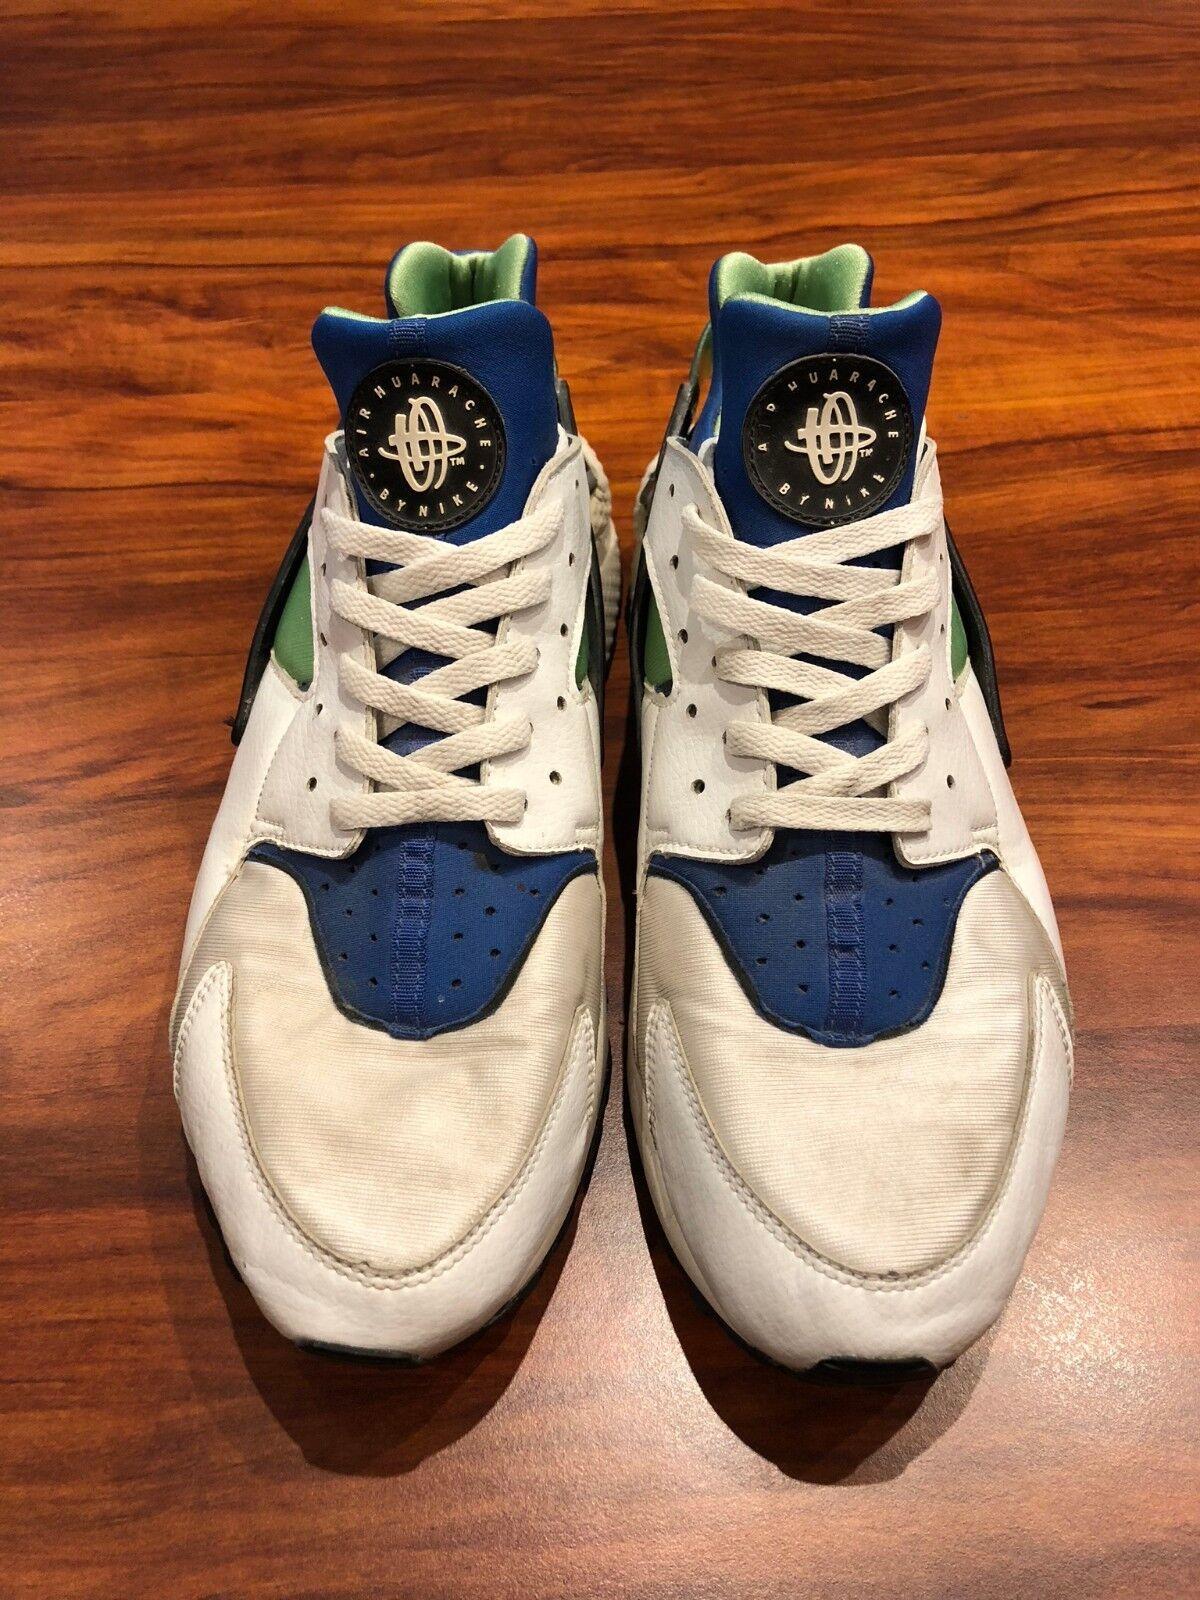 Nike Air Huarache bluee Green White Black Vintage- US 13 I I